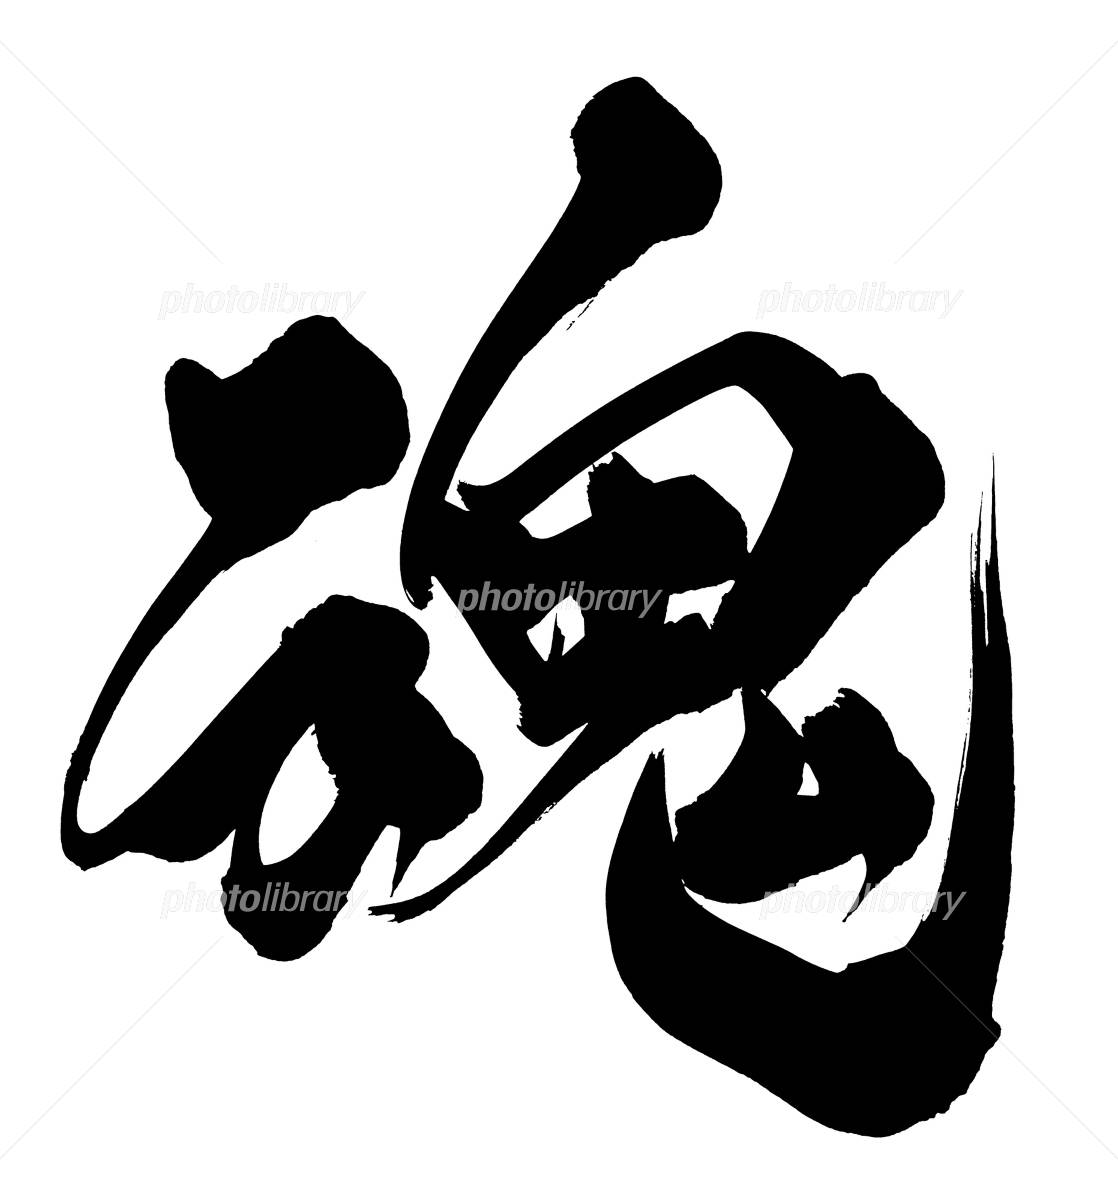 Calligraphy soul イラスト素材